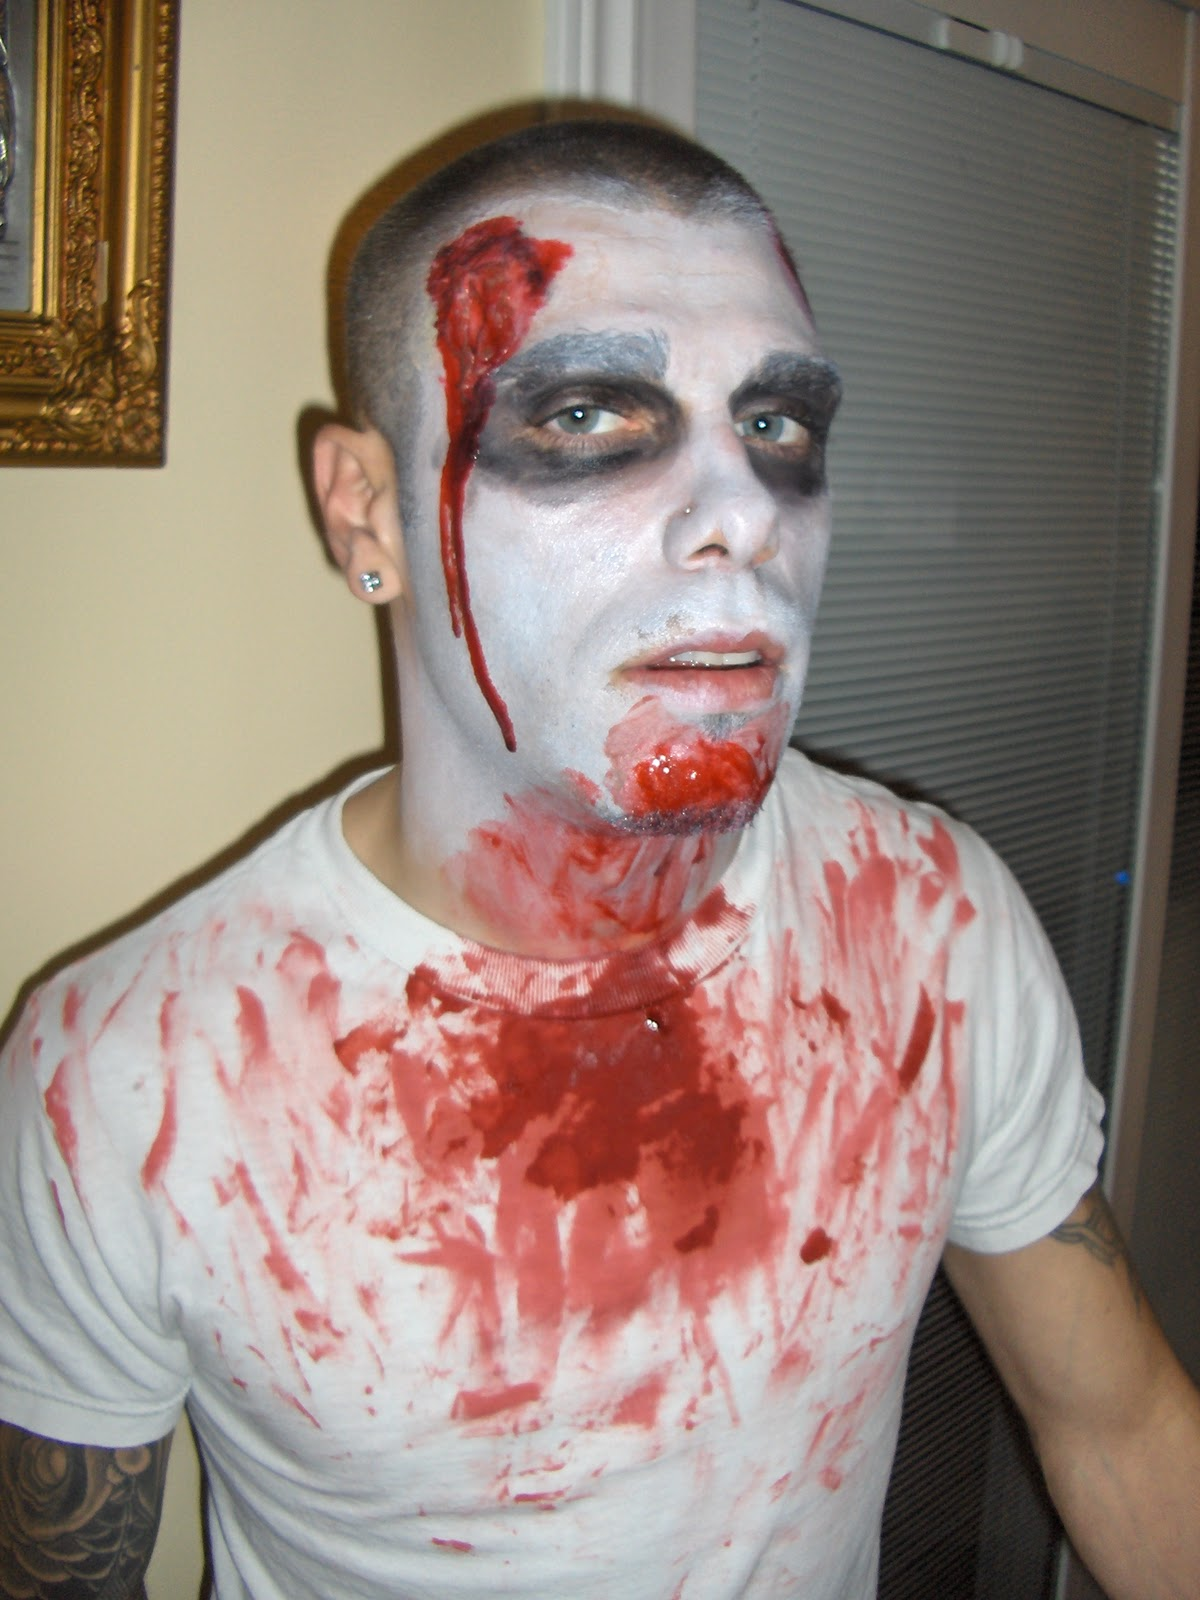 Taylor swift makeup: simple zombie makeup ideas